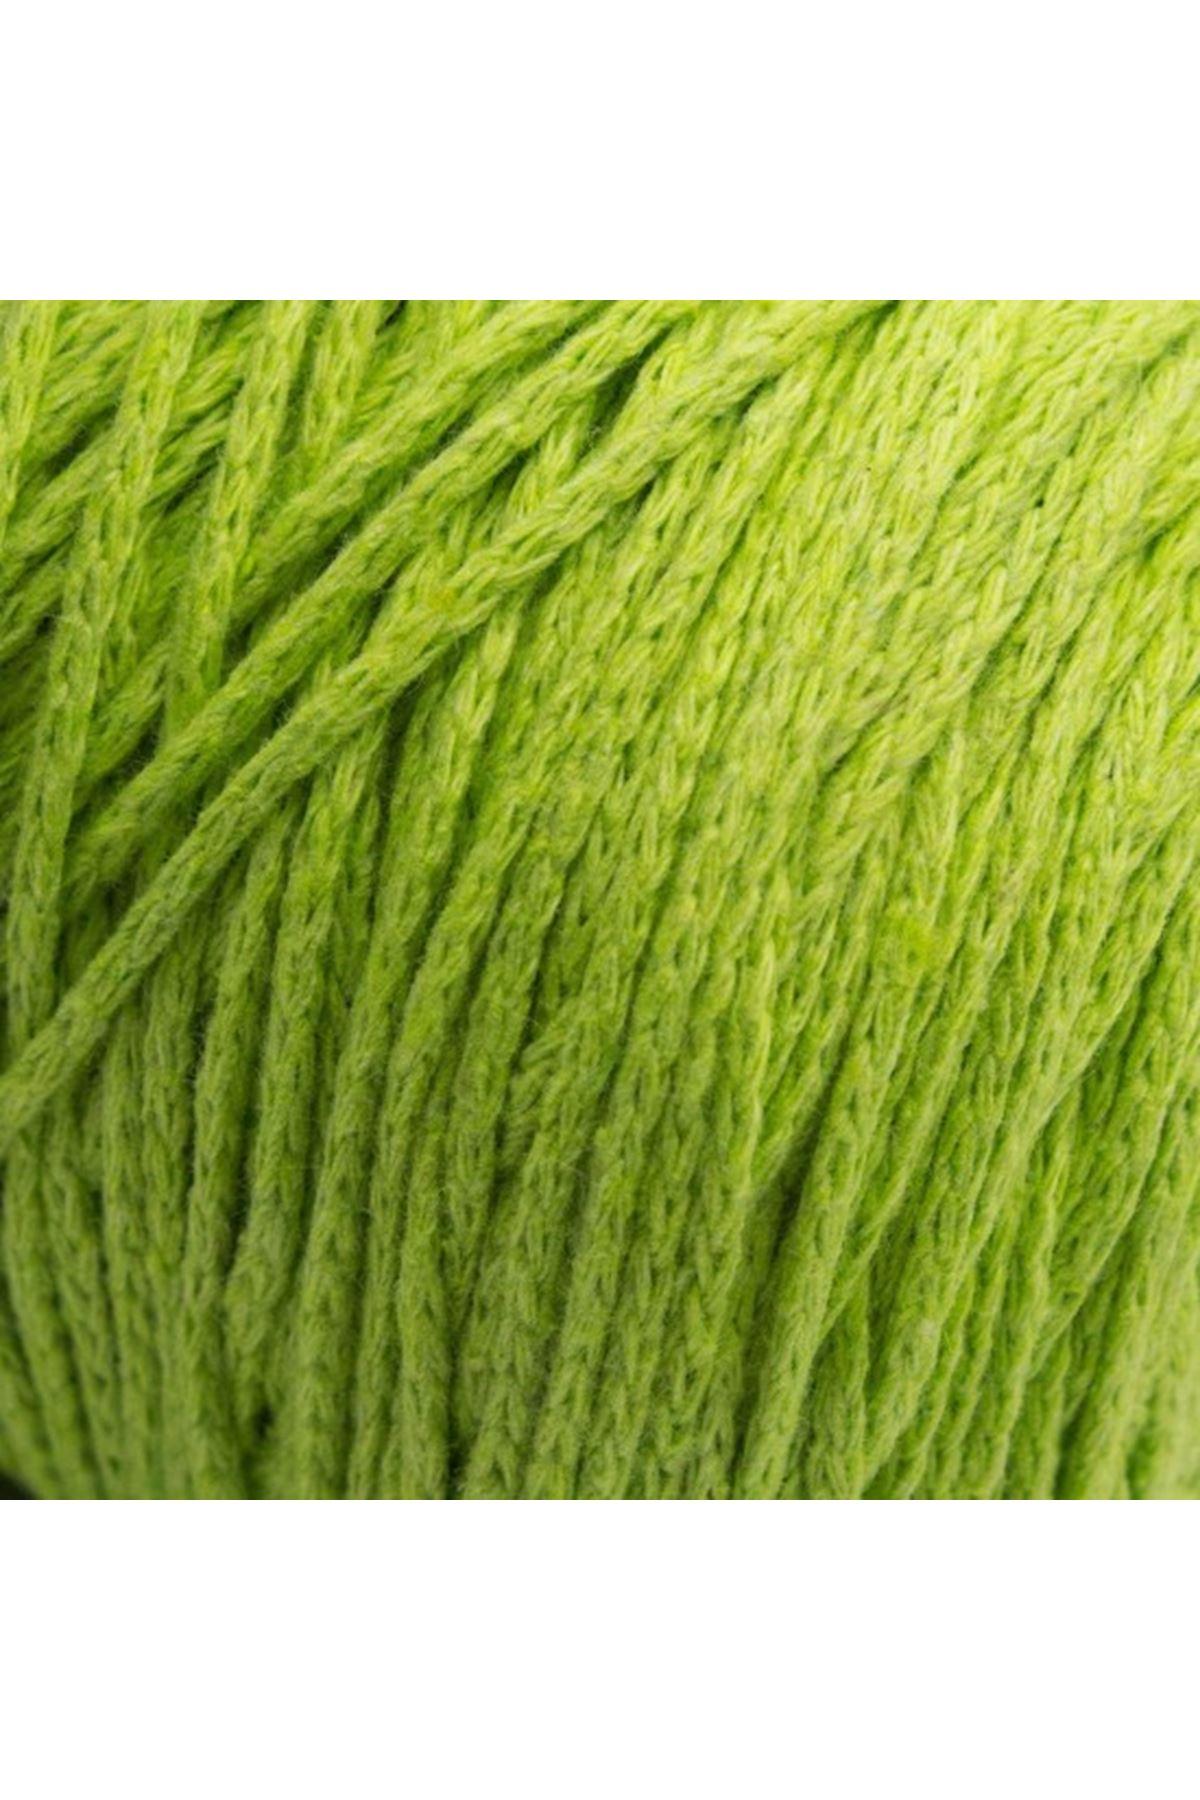 Cotton Makrome İnce - 40166 - Filiz Yeşili